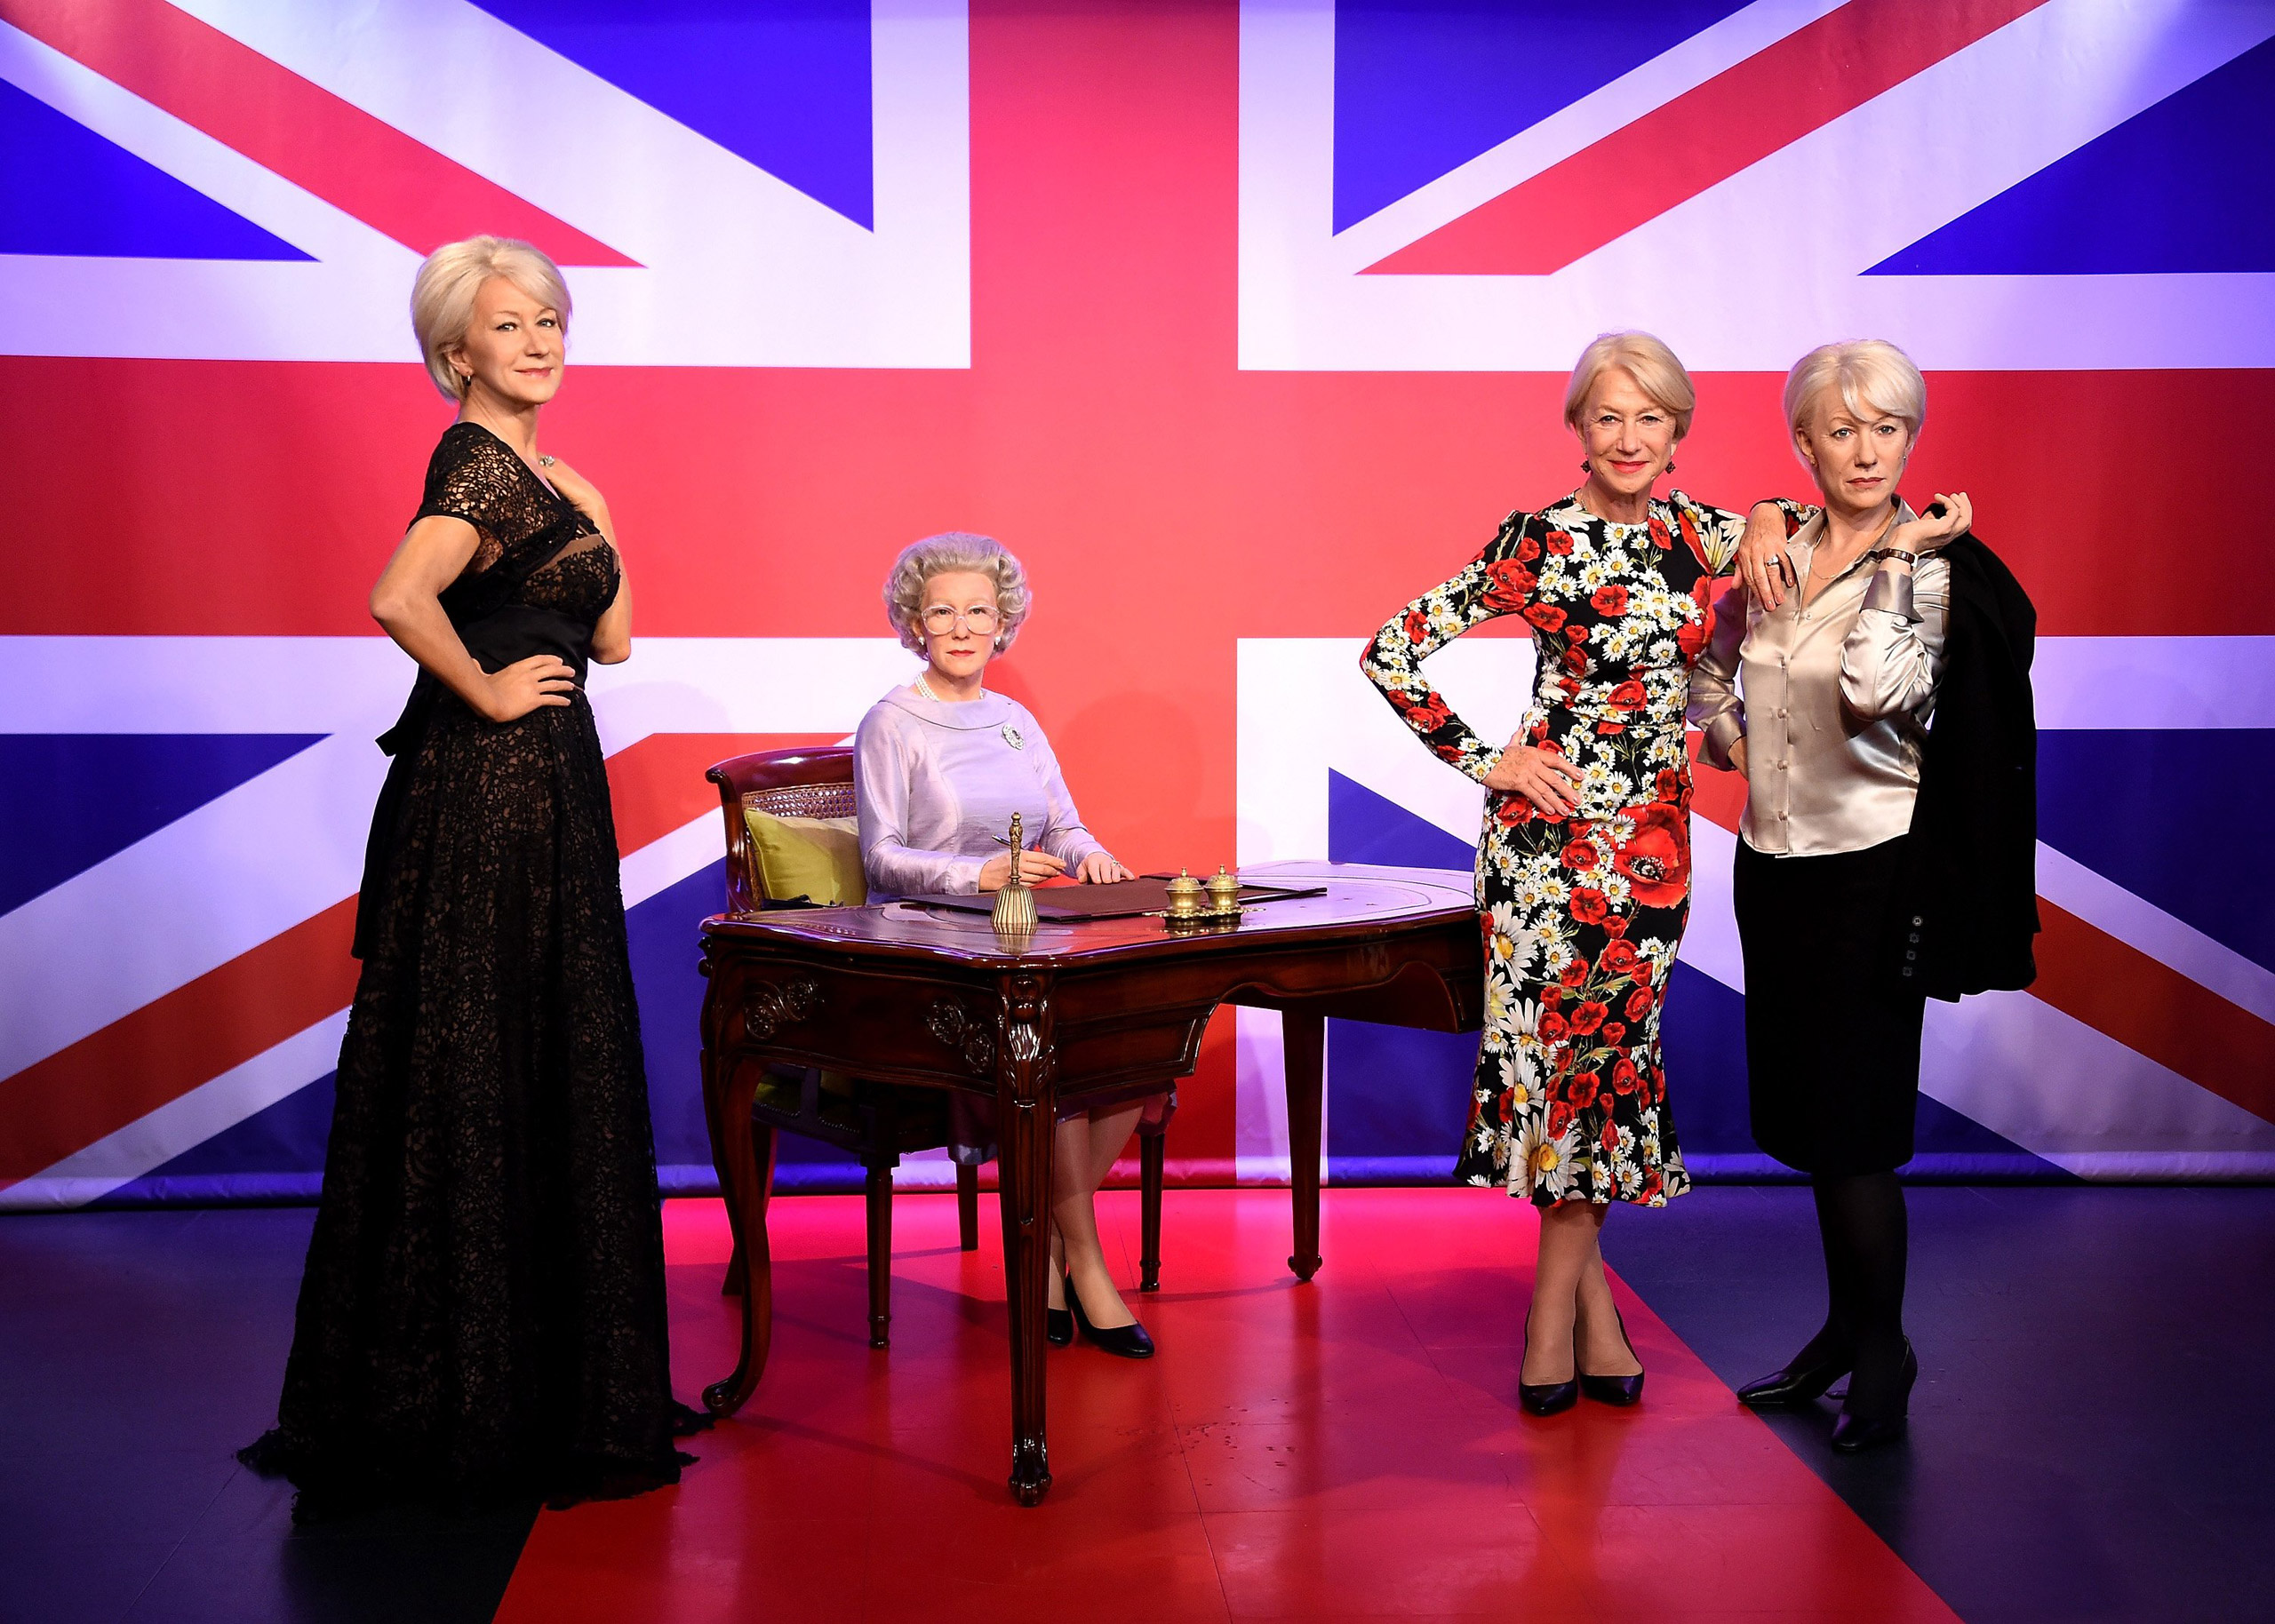 Helen Mirren meets her 3 wax figures at Madame Tussauds on July 30, 2015 in London.